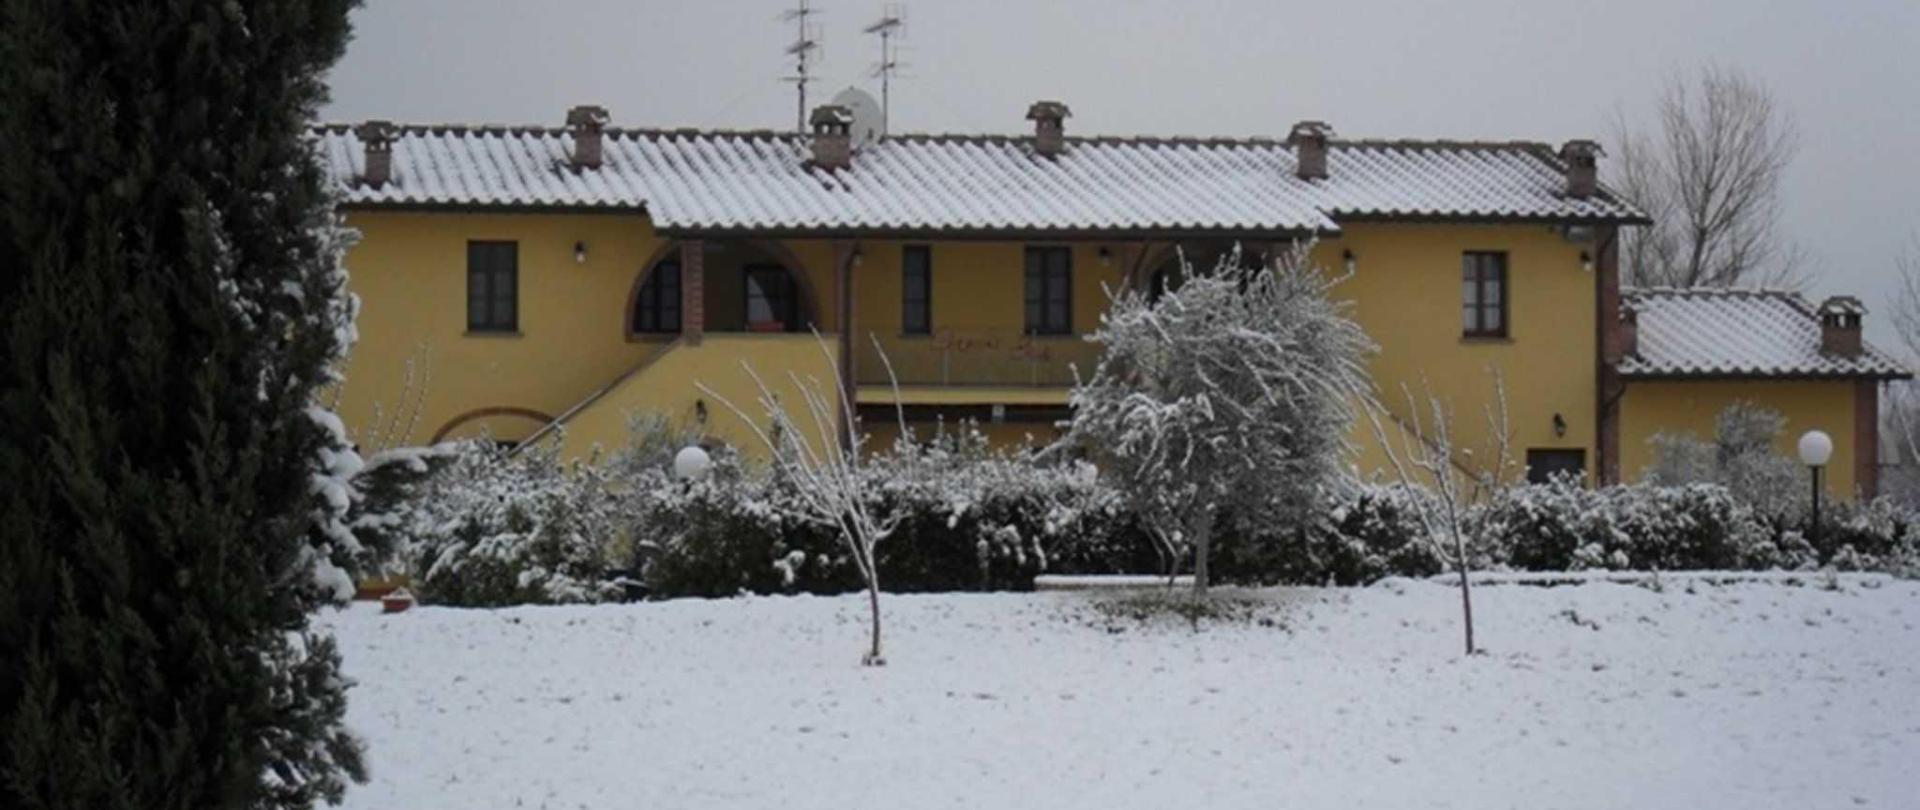 esterno-neve.jpg